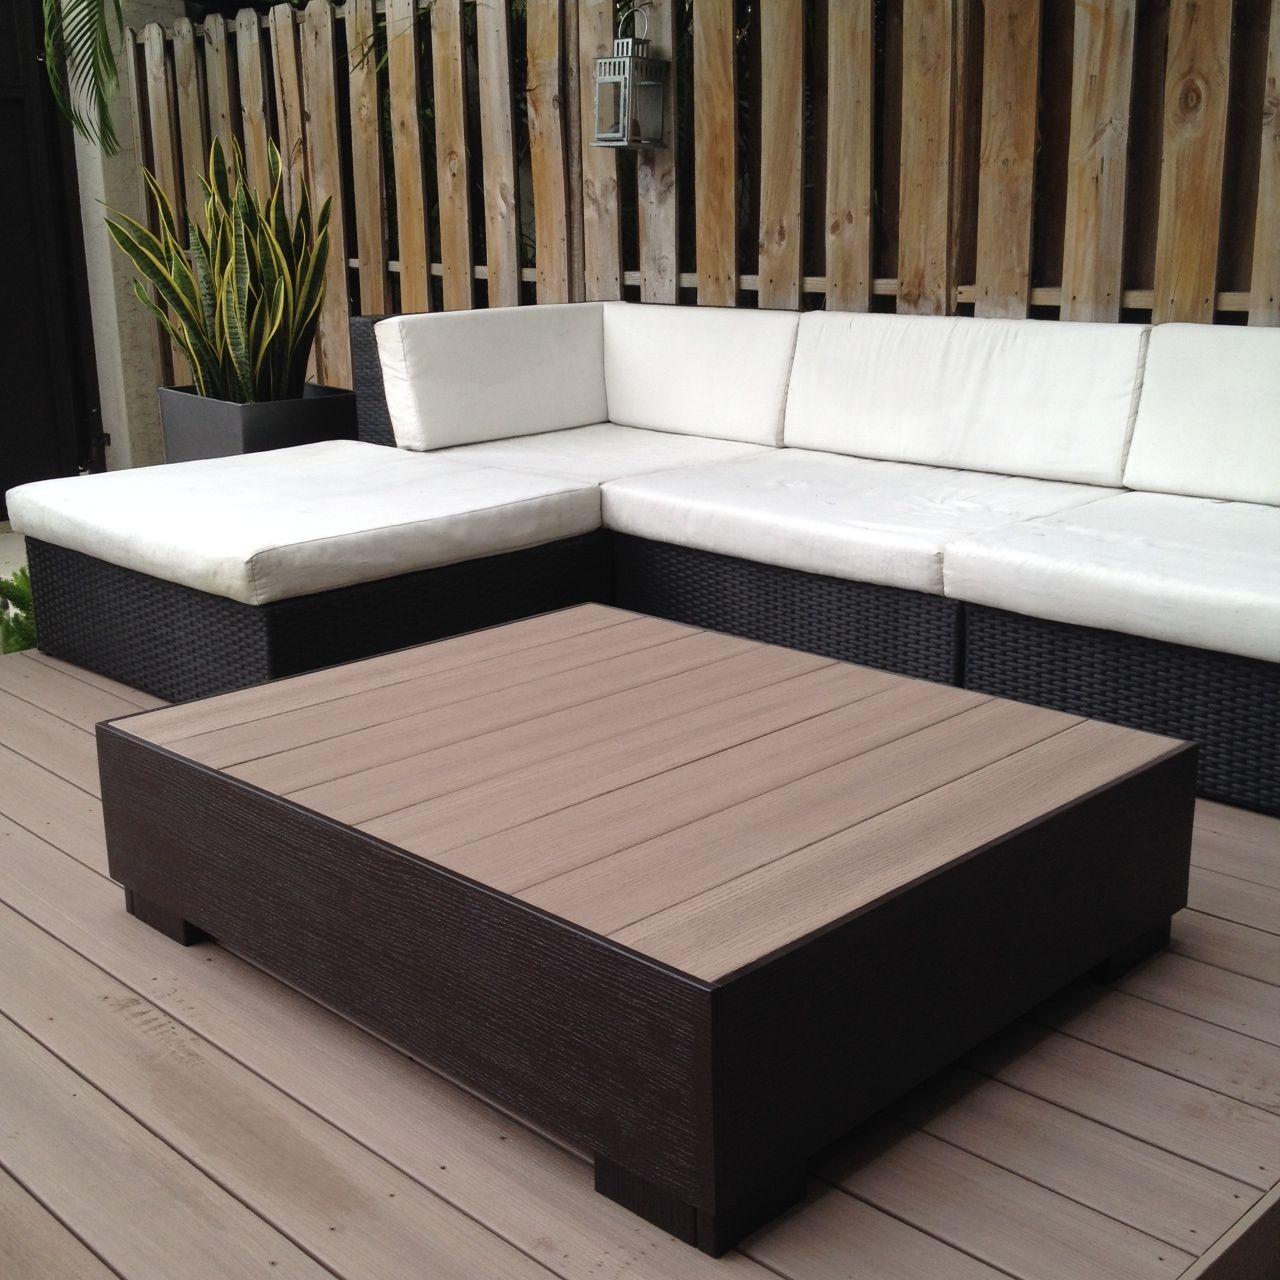 Custom Coffee Table. Plastic Deck Wood. Two Tone Paint